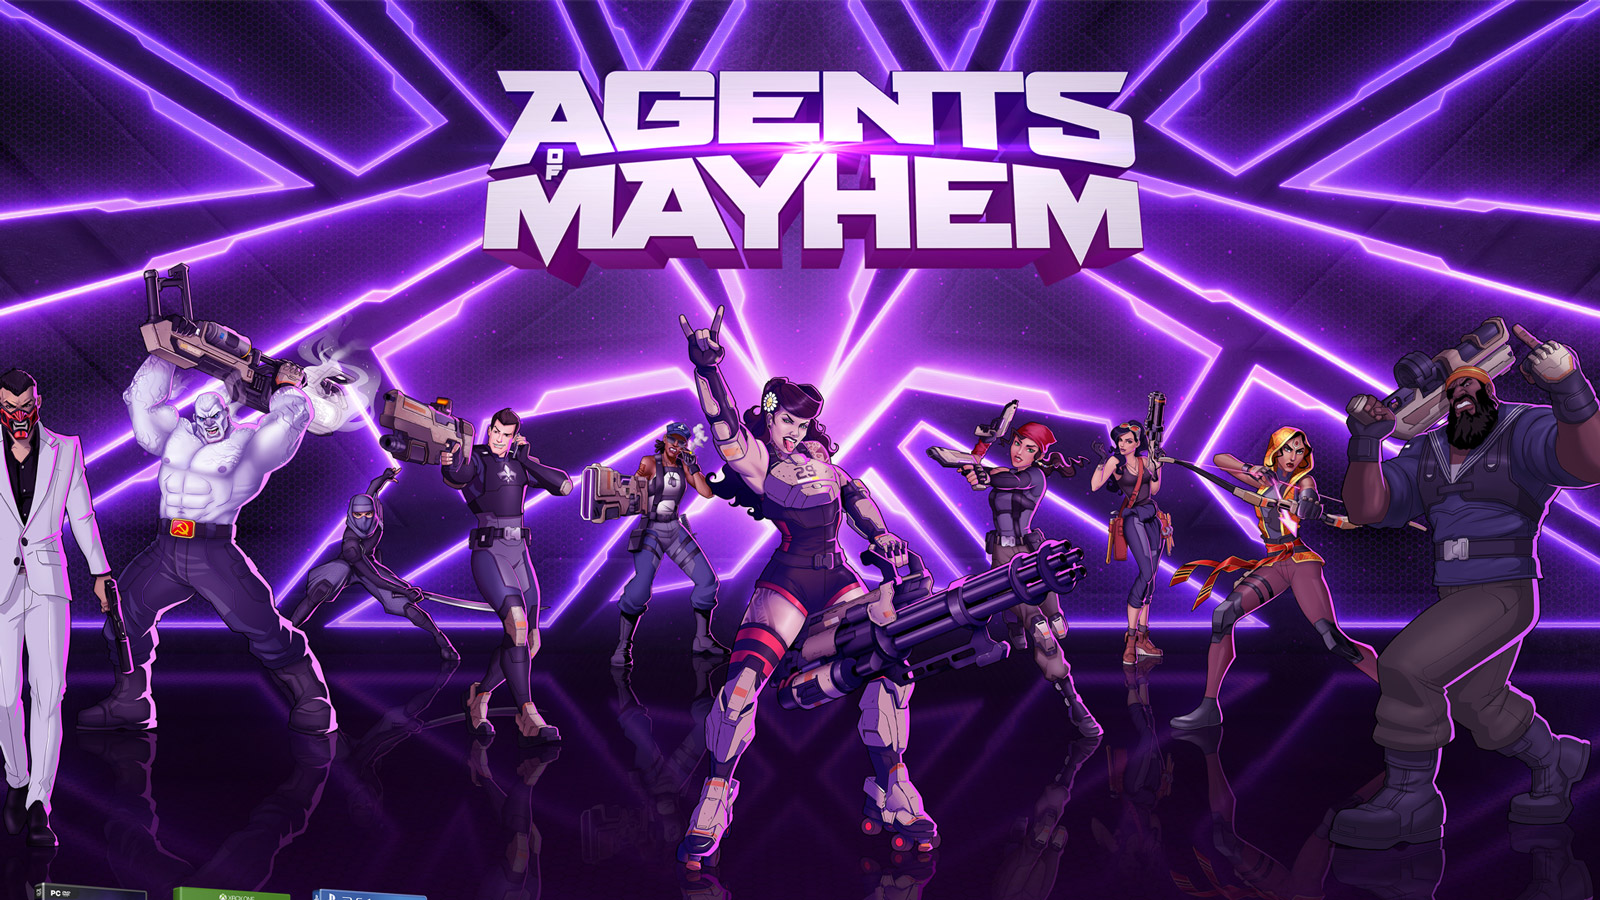 Free Agents of Mayhem Wallpaper in 1600x900